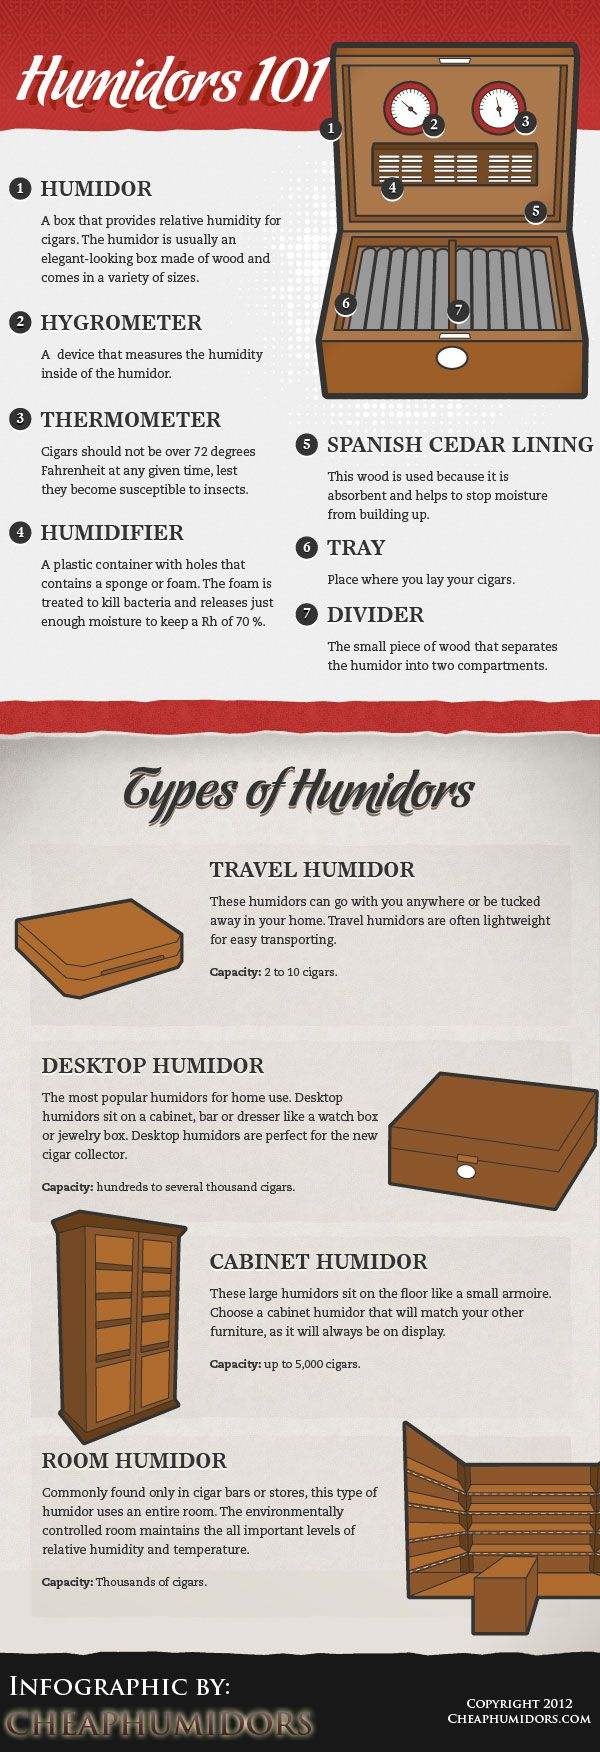 [INFOGRAPHIC] Cigar Humidors 101 | CheapHumidors.com Blog